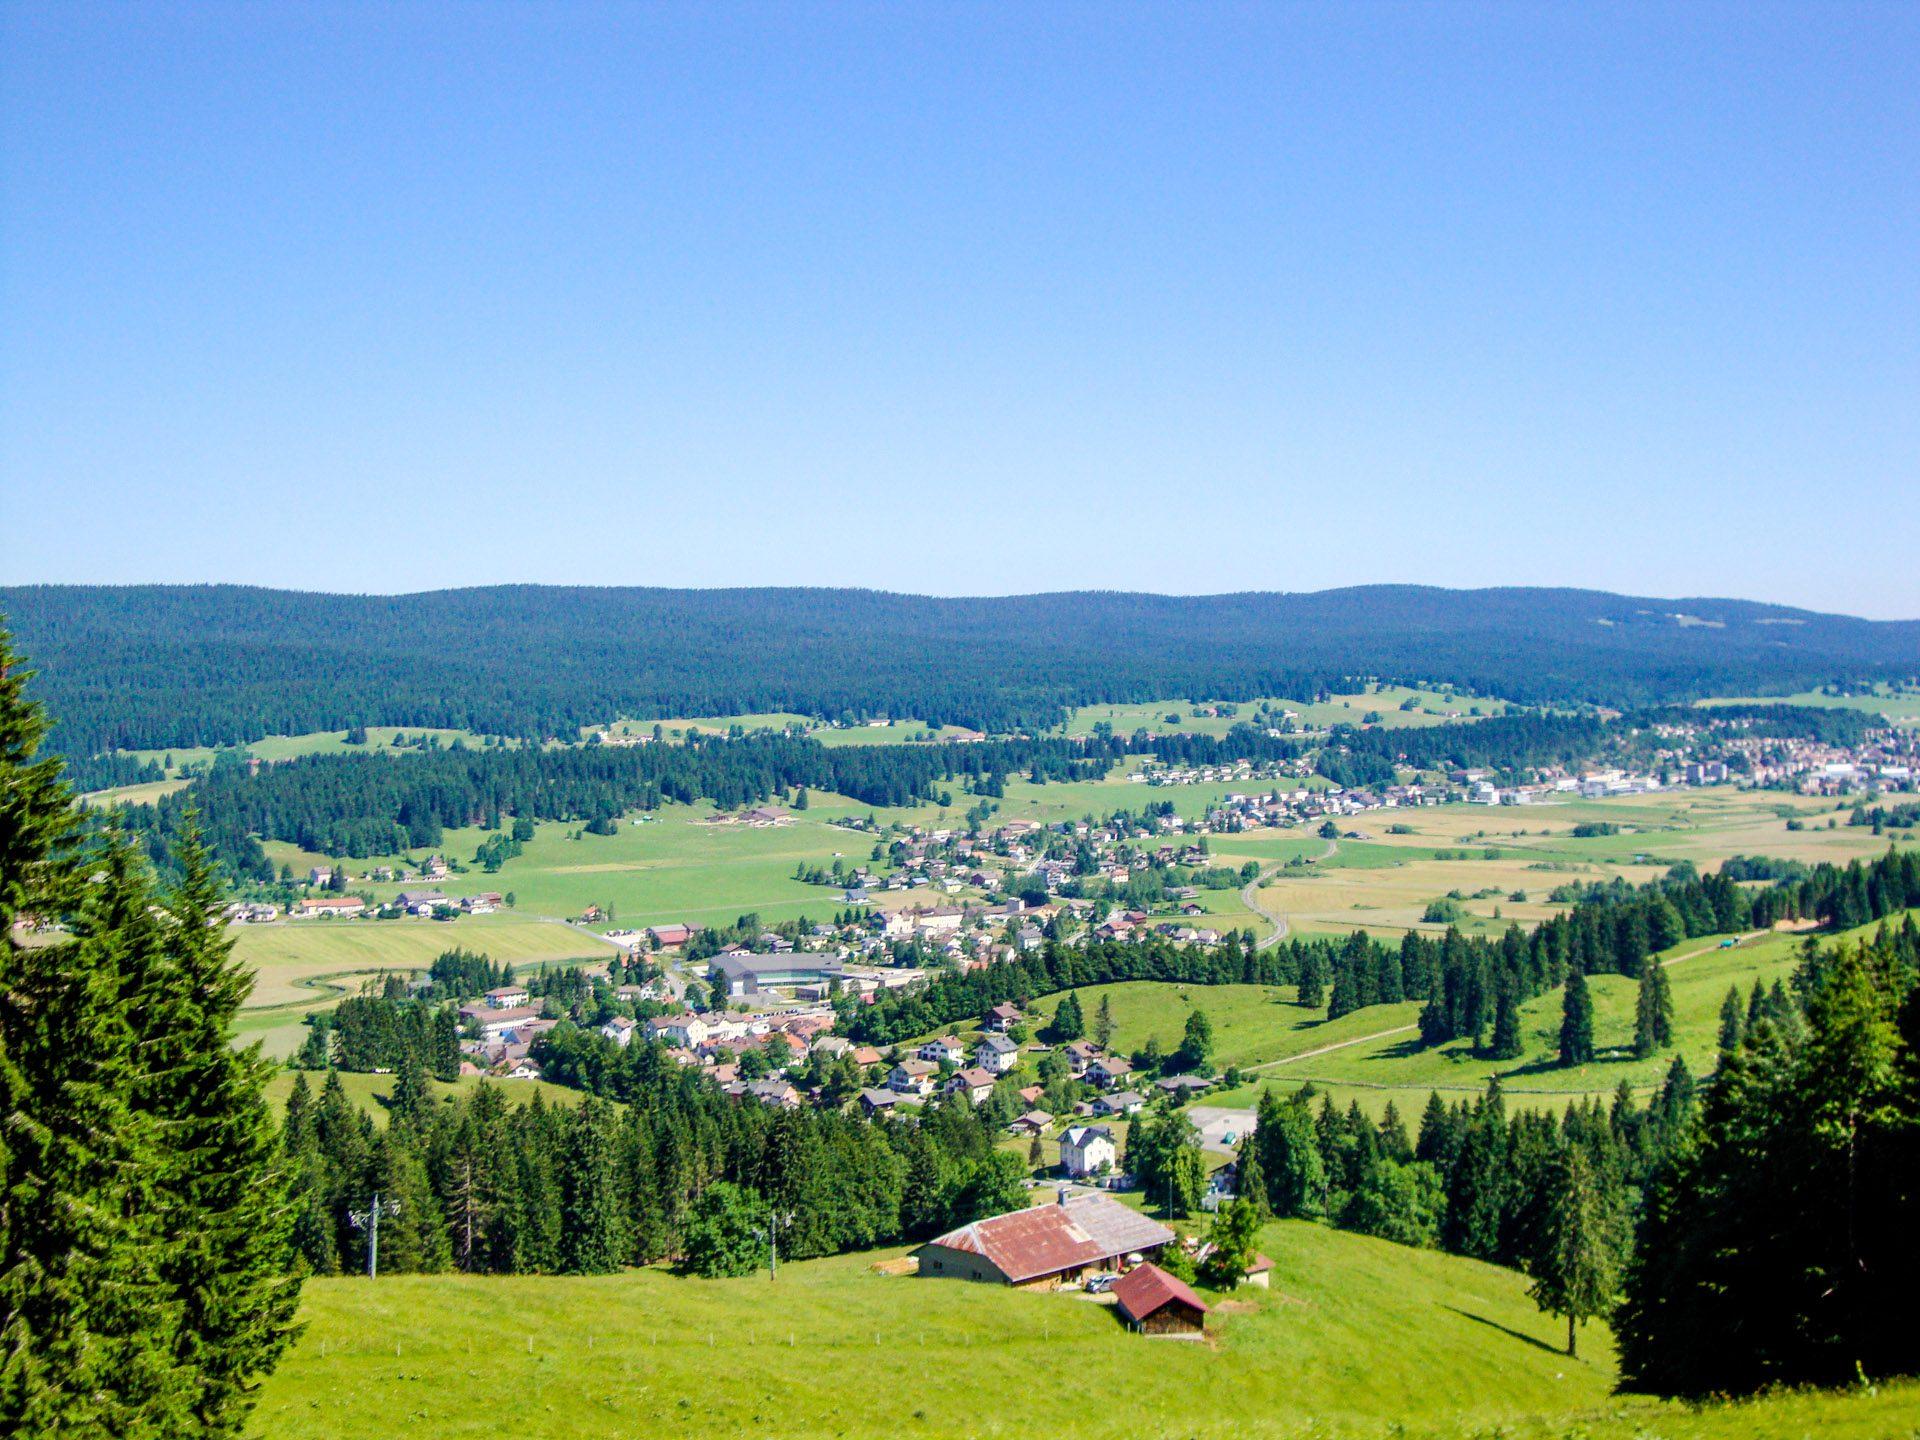 Green rolling hills of Switzerland